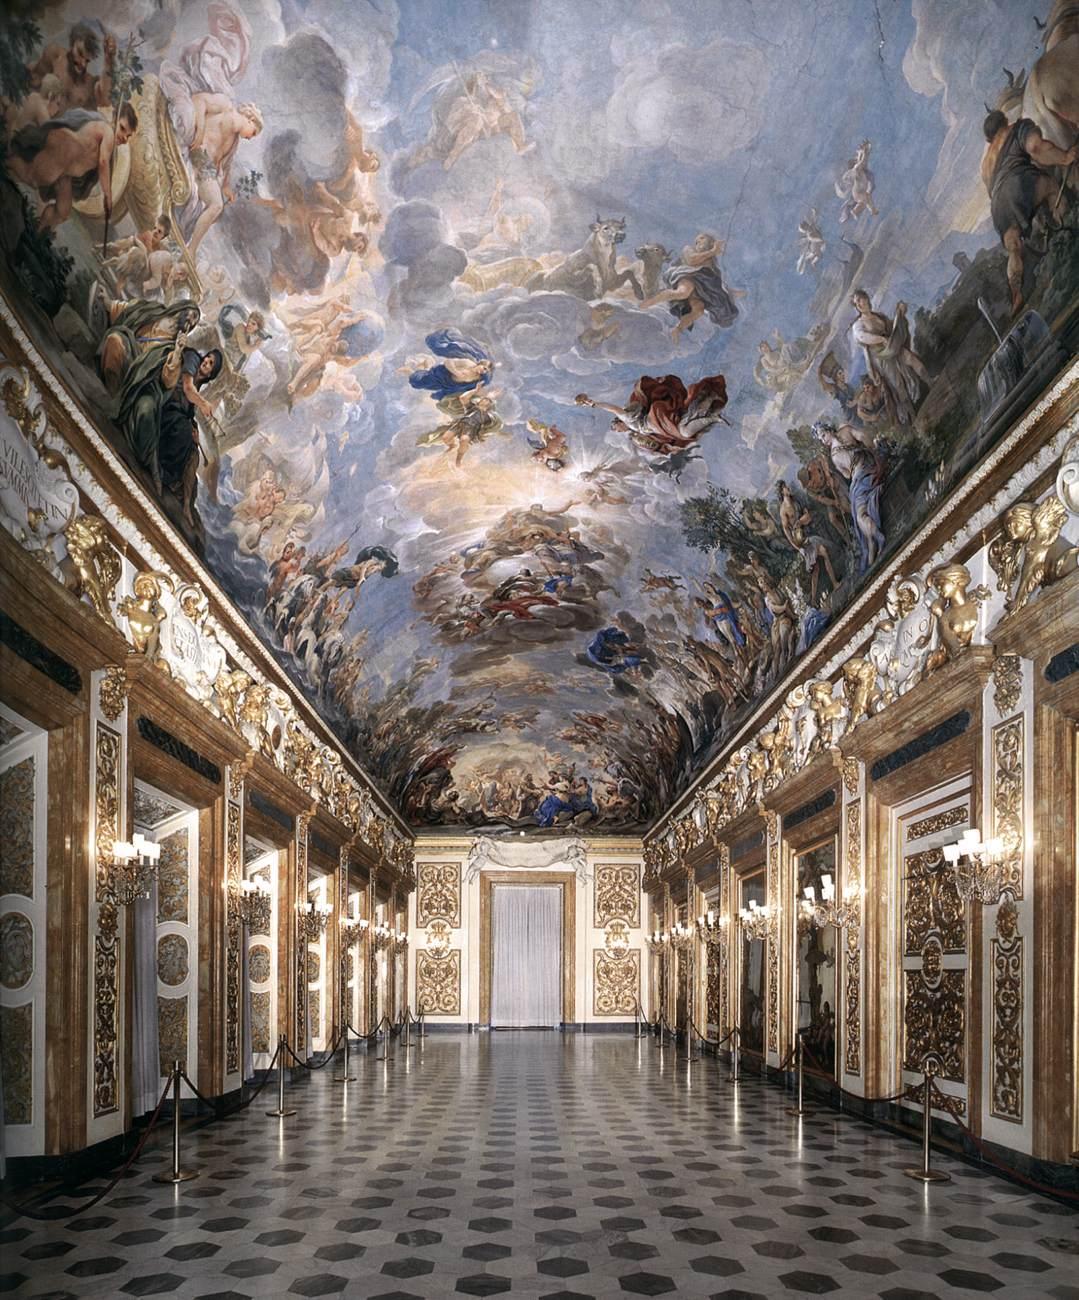 Luca Giordano, Galleria Riccardiana, 1683-85, Fresco, Palazzo Medici Riccardi, Florence